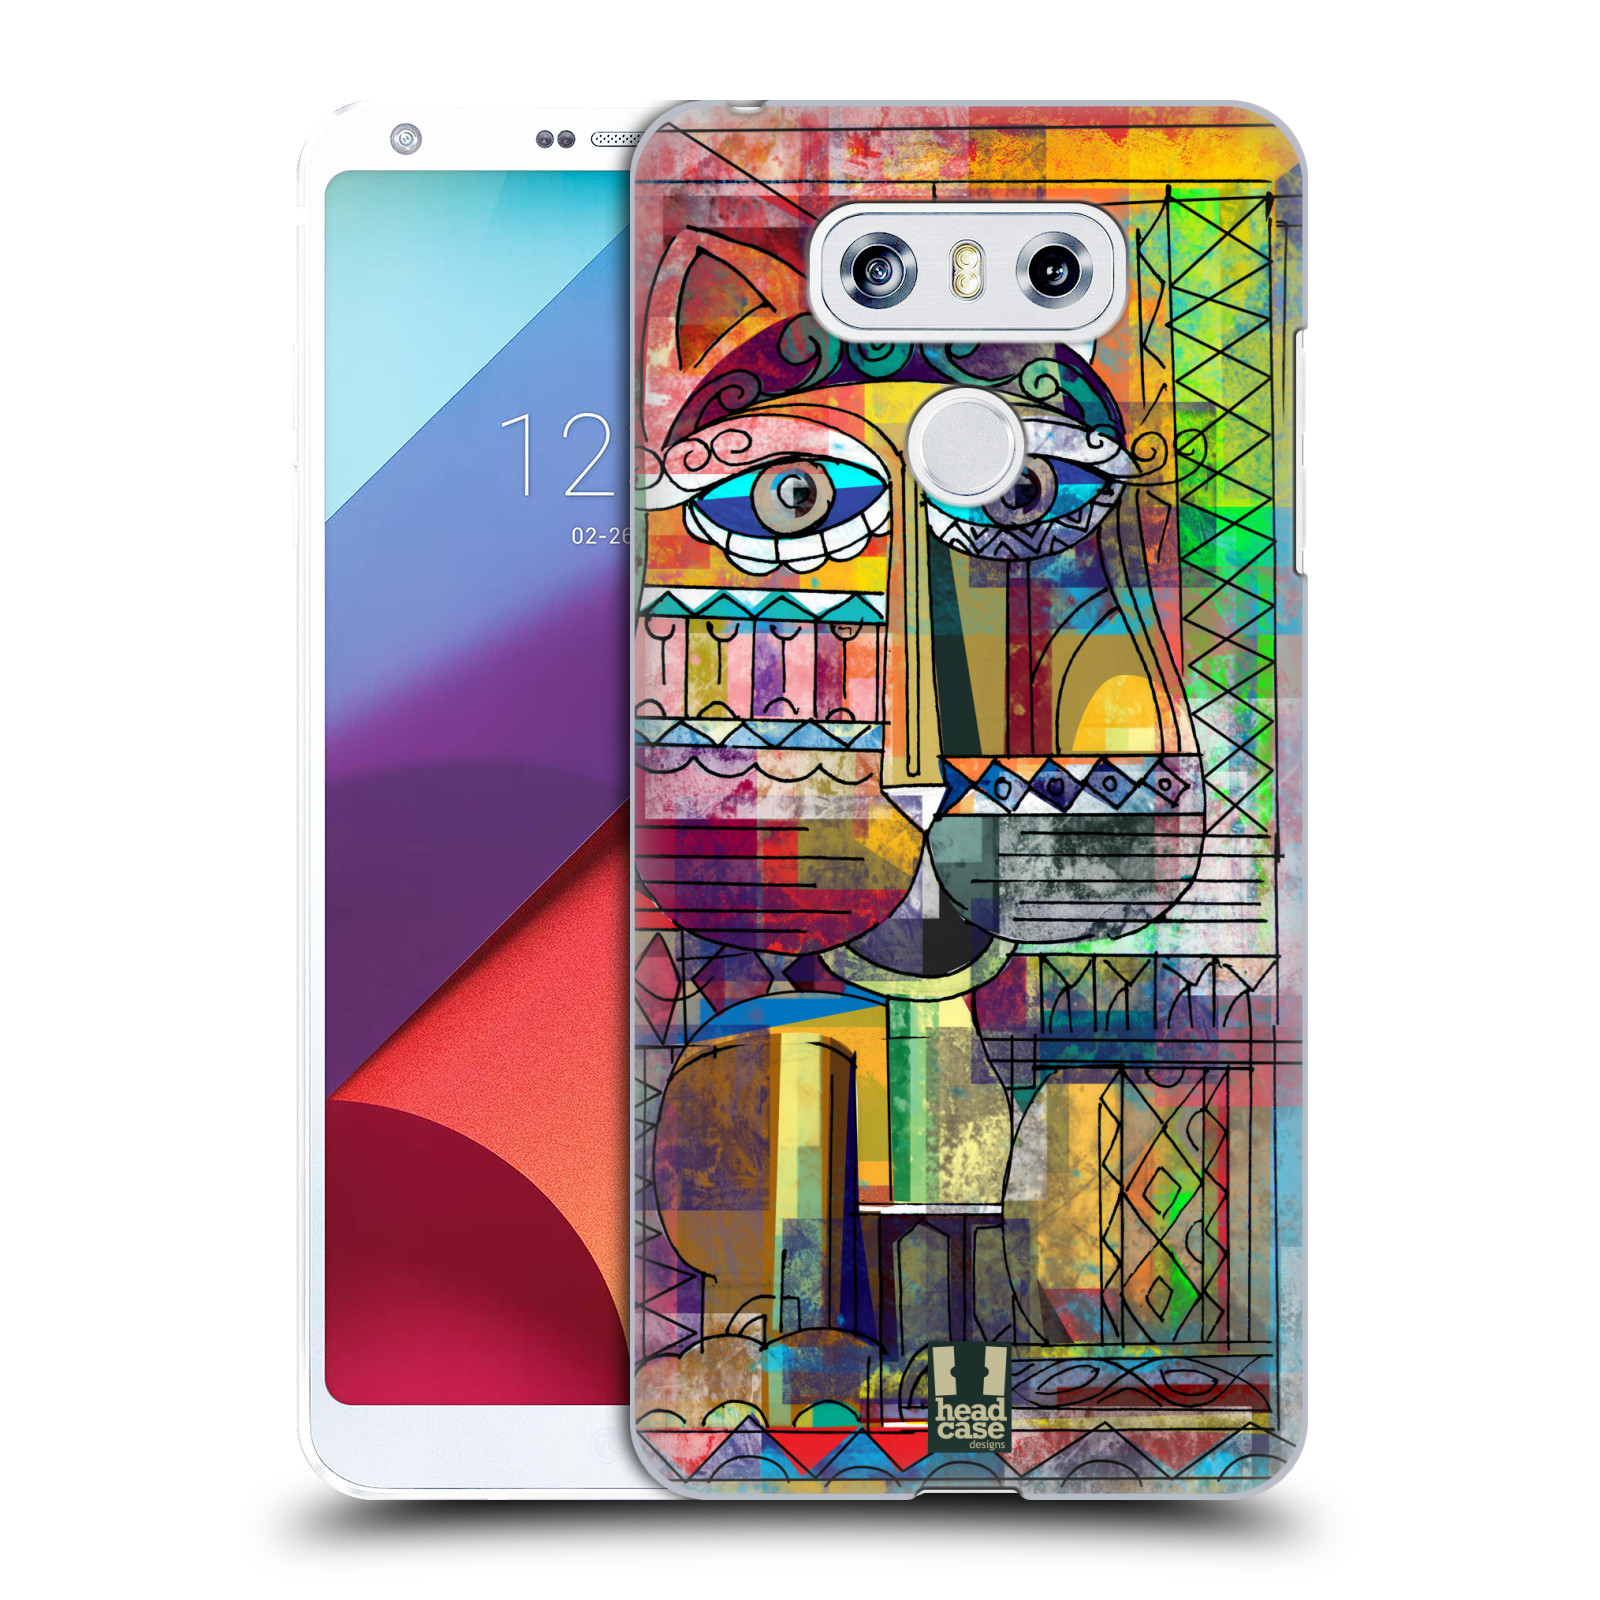 Plastové pouzdro na mobil LG G6 - Head Case AZTEC KORAT